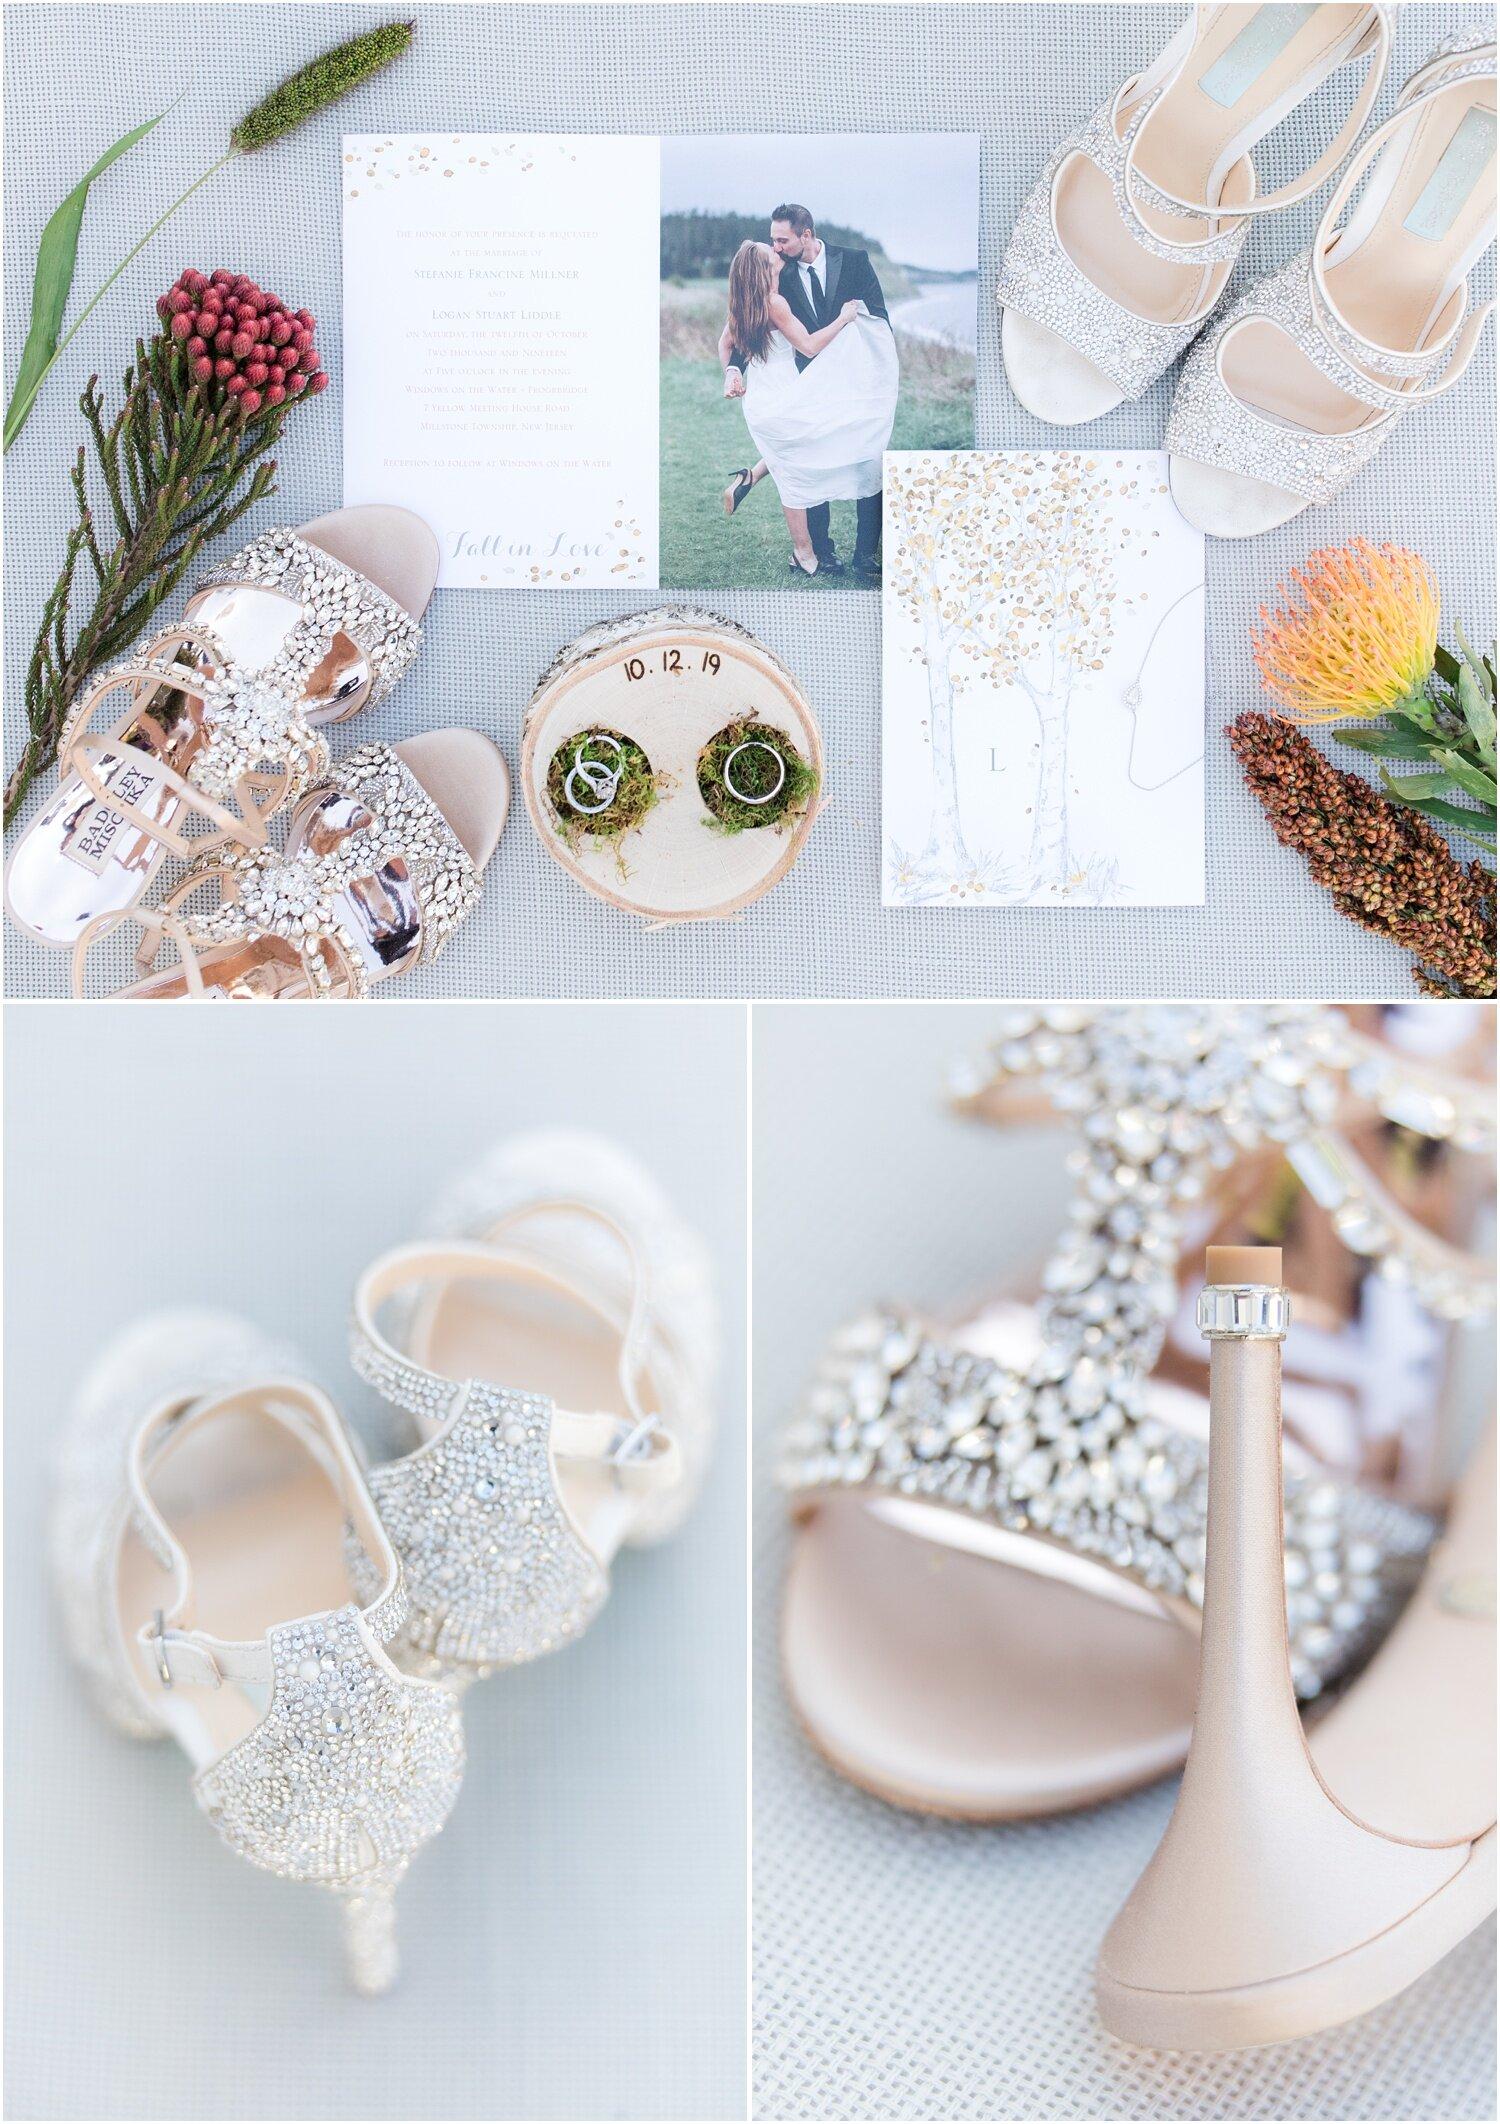 Custom Birch ring box an trifold wedding invitation and rhinestone wedding shoes